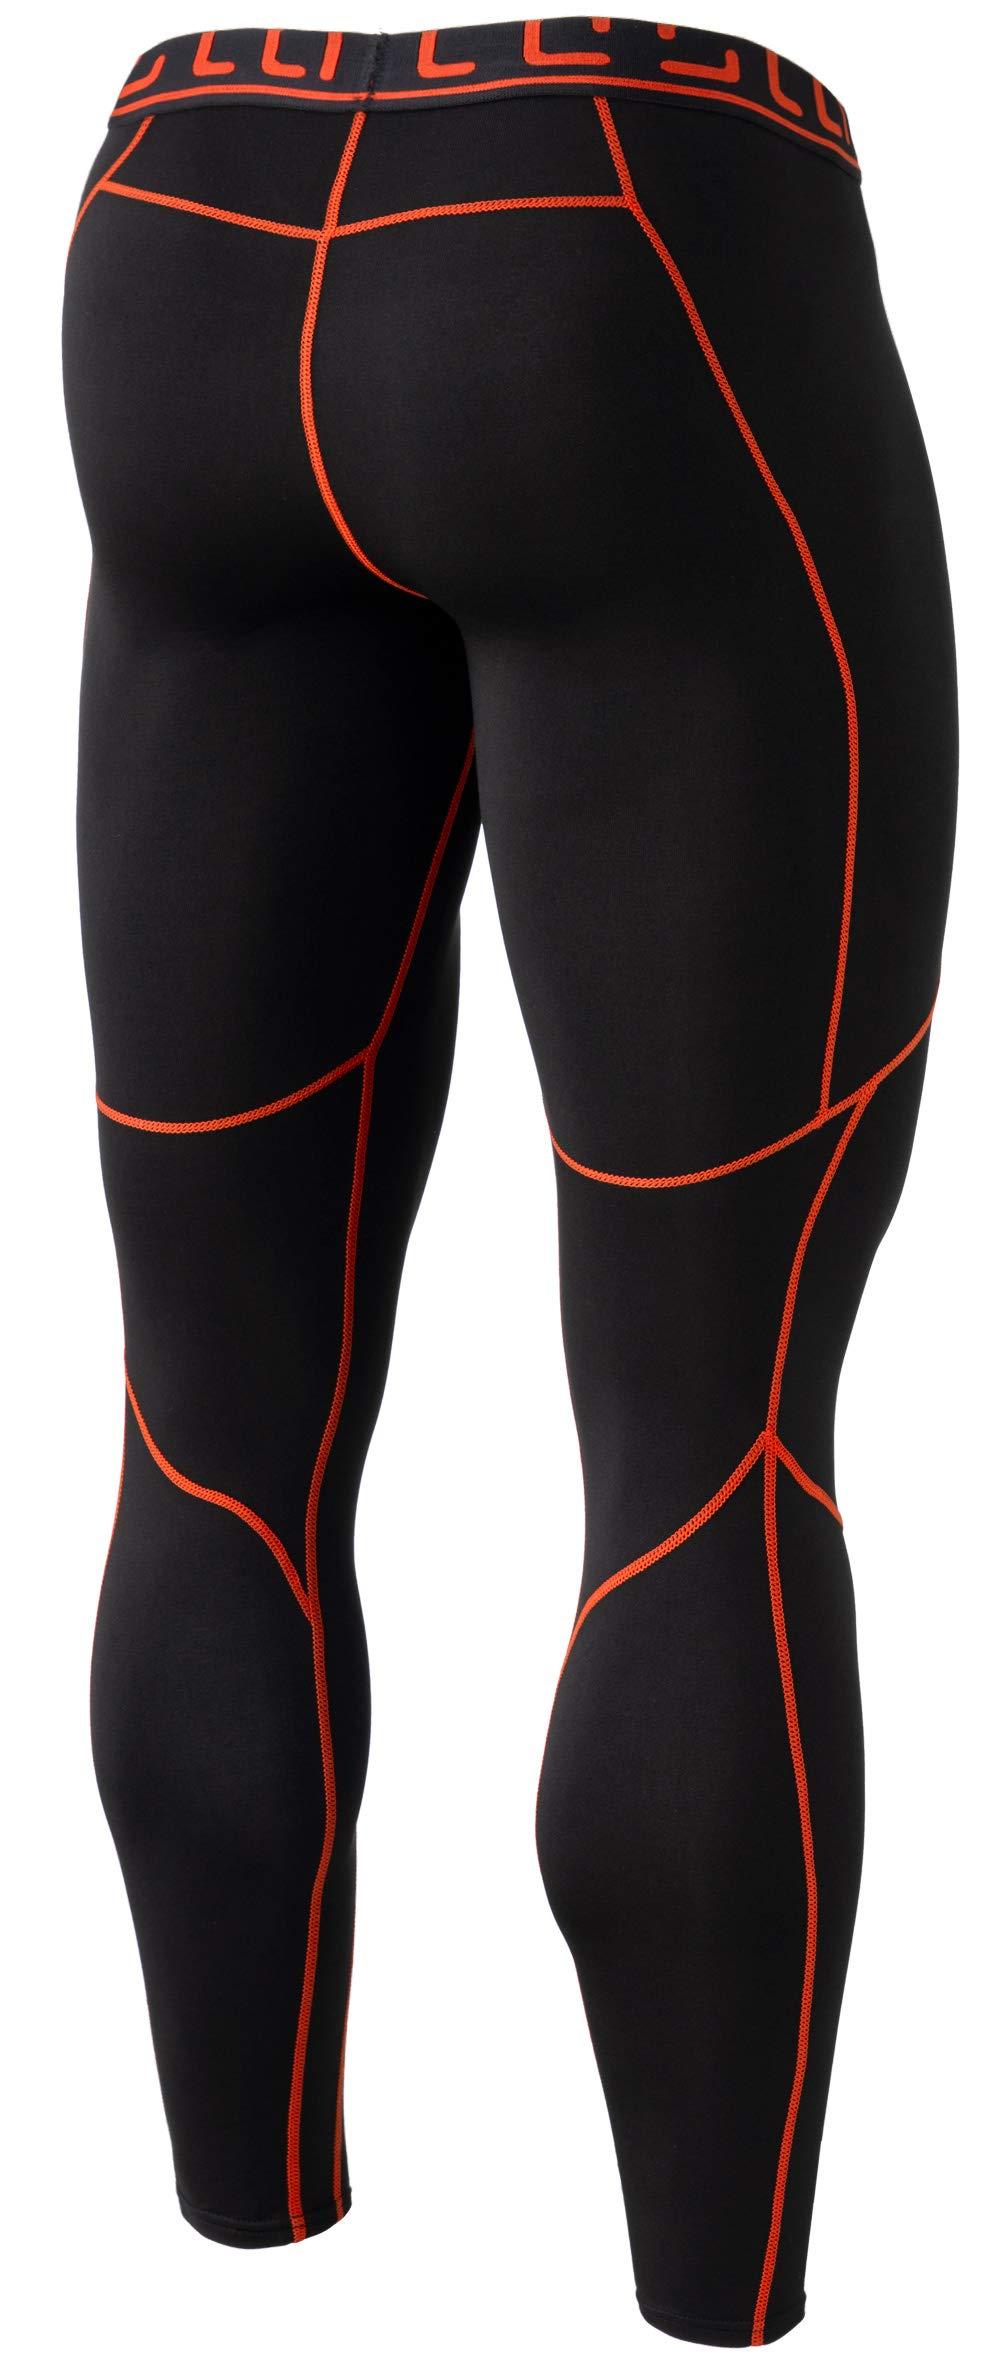 TM-YUP43-KOG_2X-Large Tesla Men's Thermal Wintergear Compression Baselayer Pants Leggings Tights YUP43 by TSLA (Image #2)